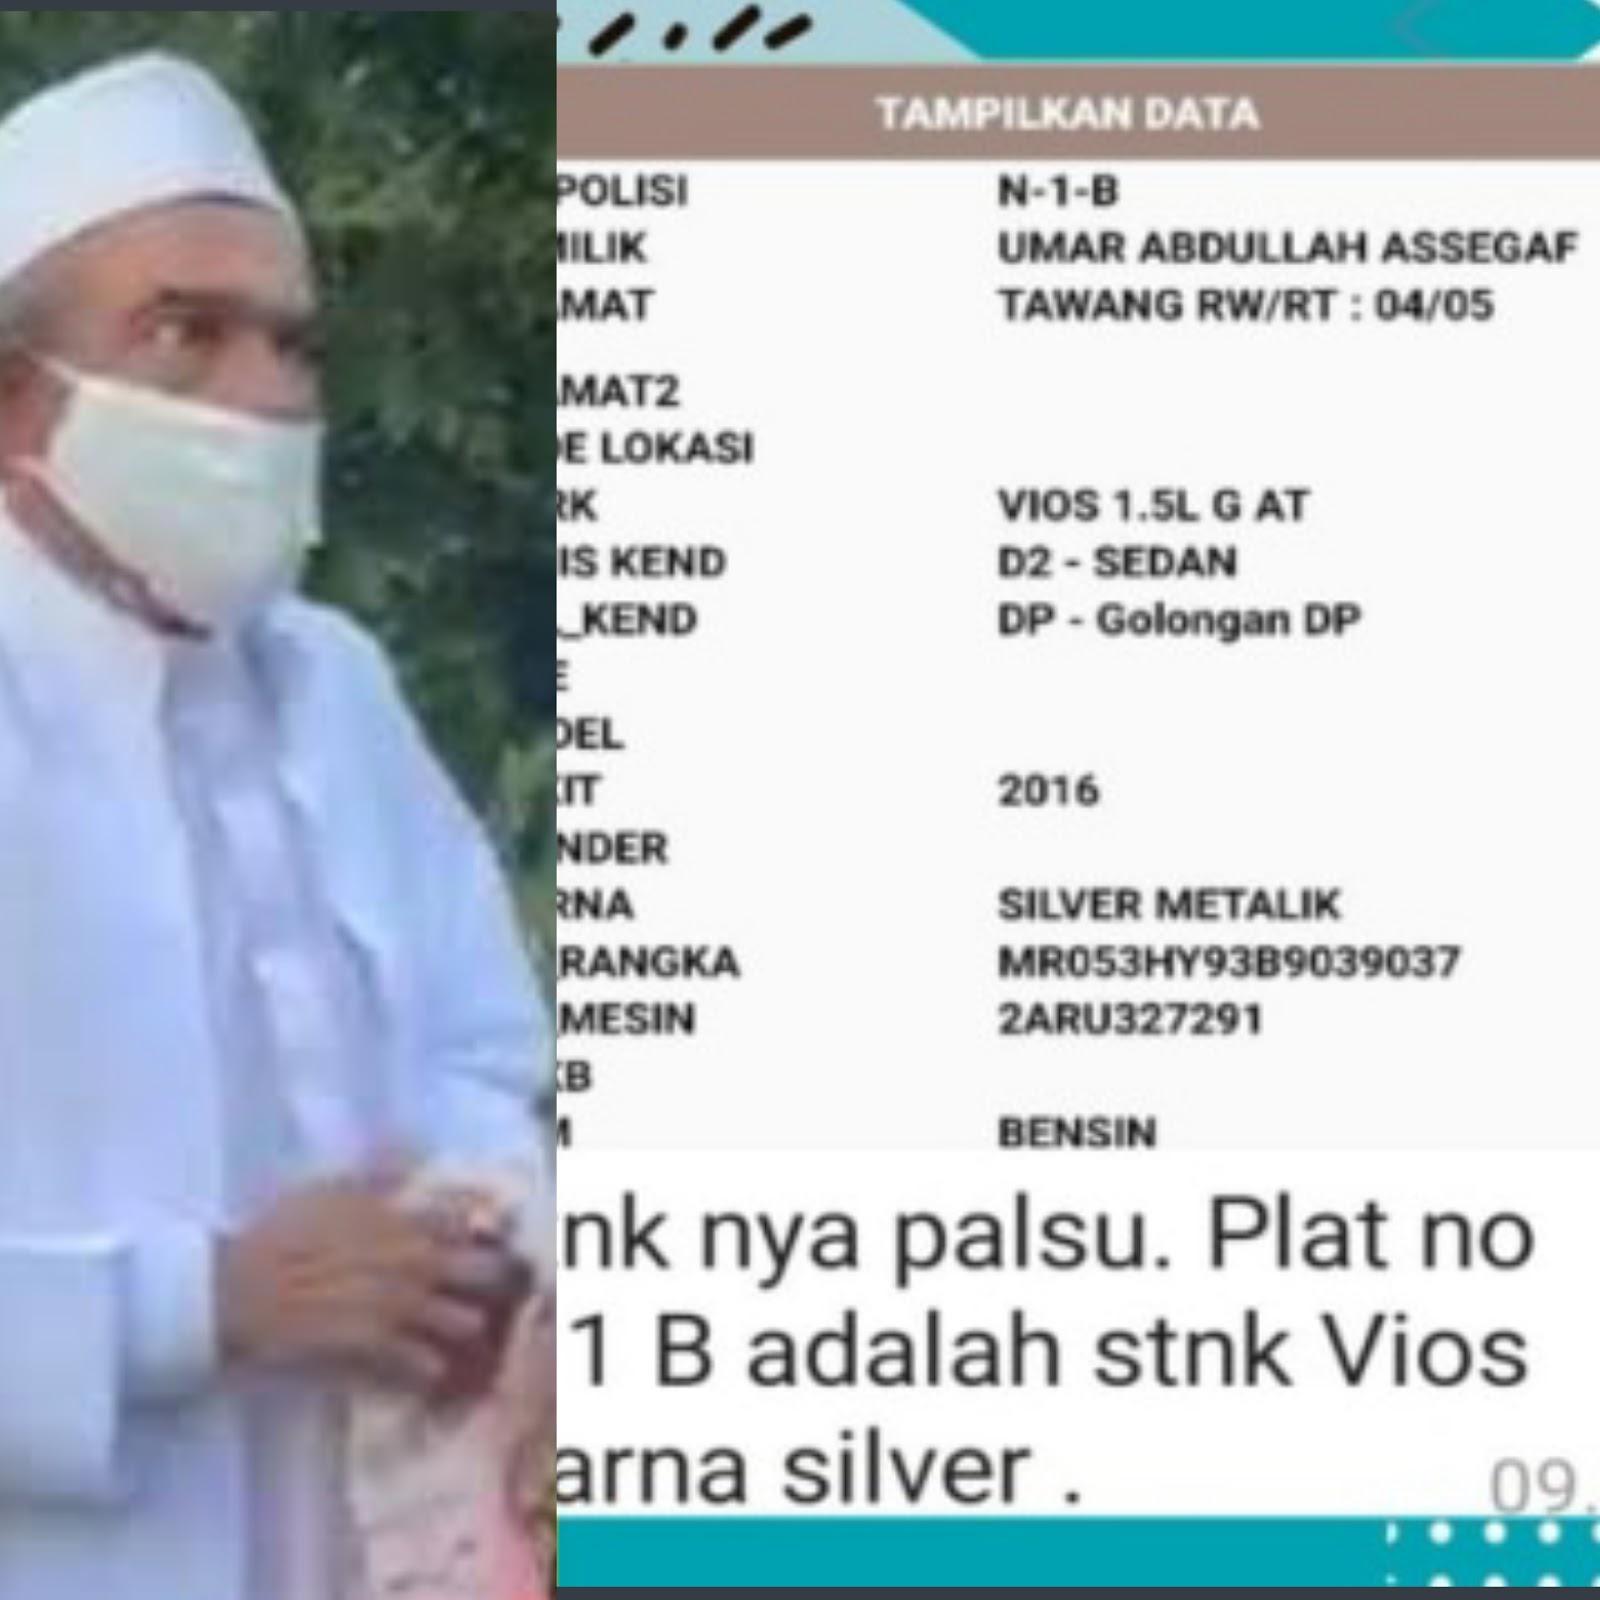 Allah Tunjukkan Kebenaran Lewat Plat Mobil Habib Umar